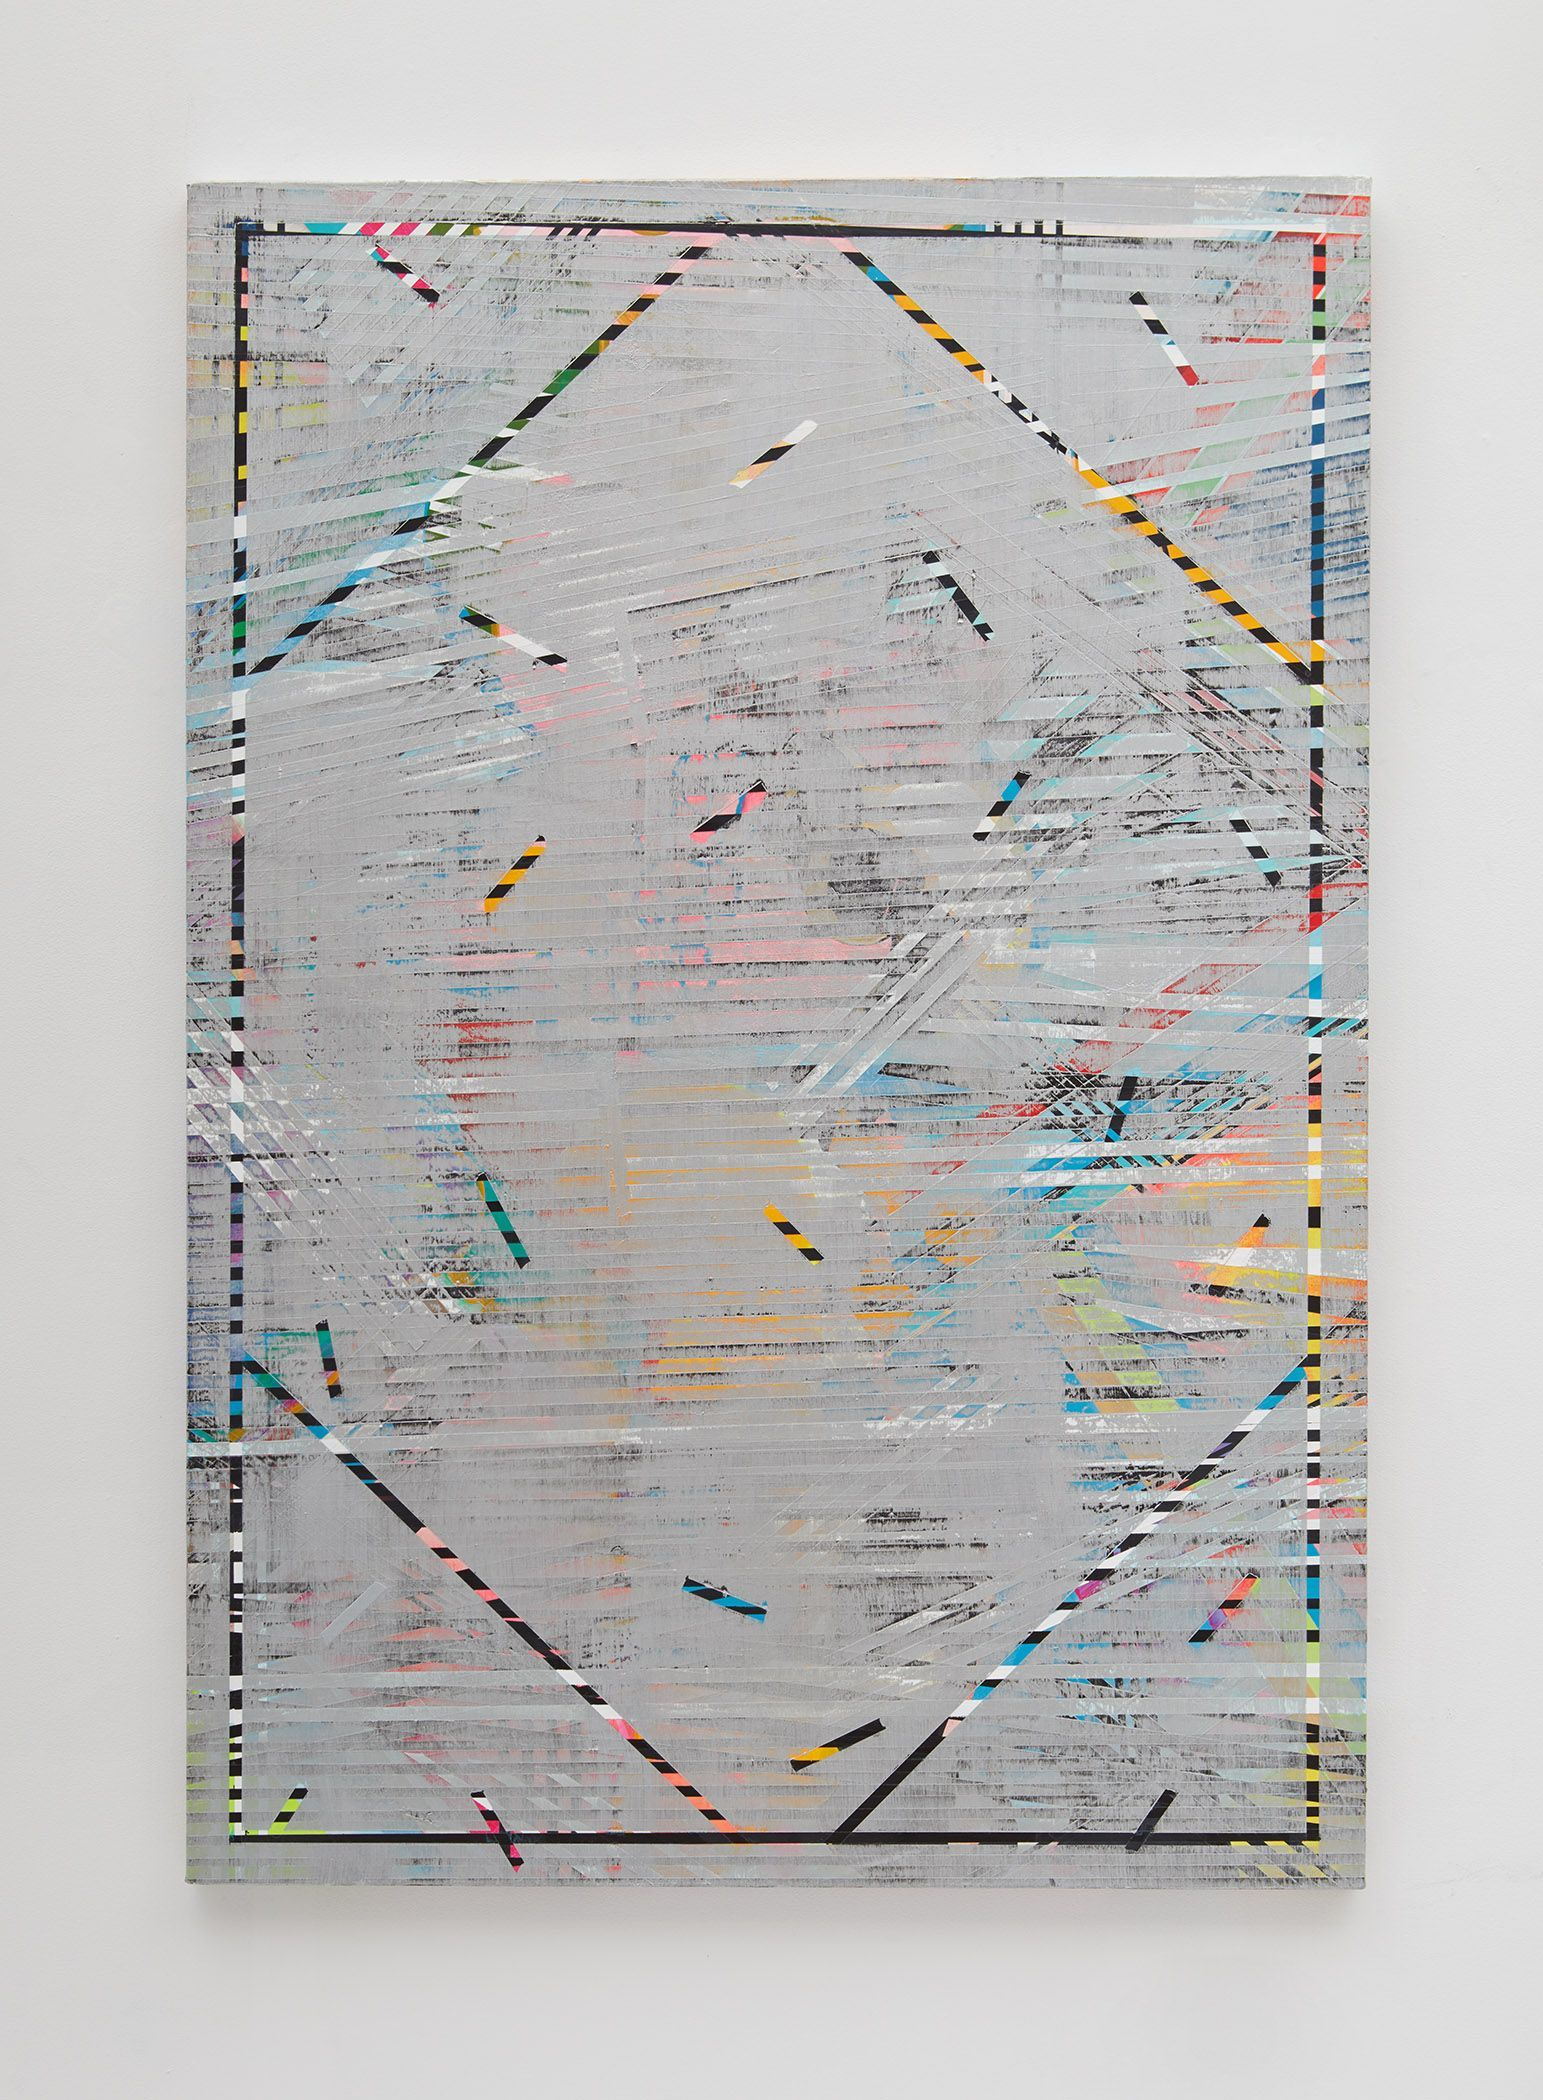 Julia dault artists marianne boesky gallery chelsea